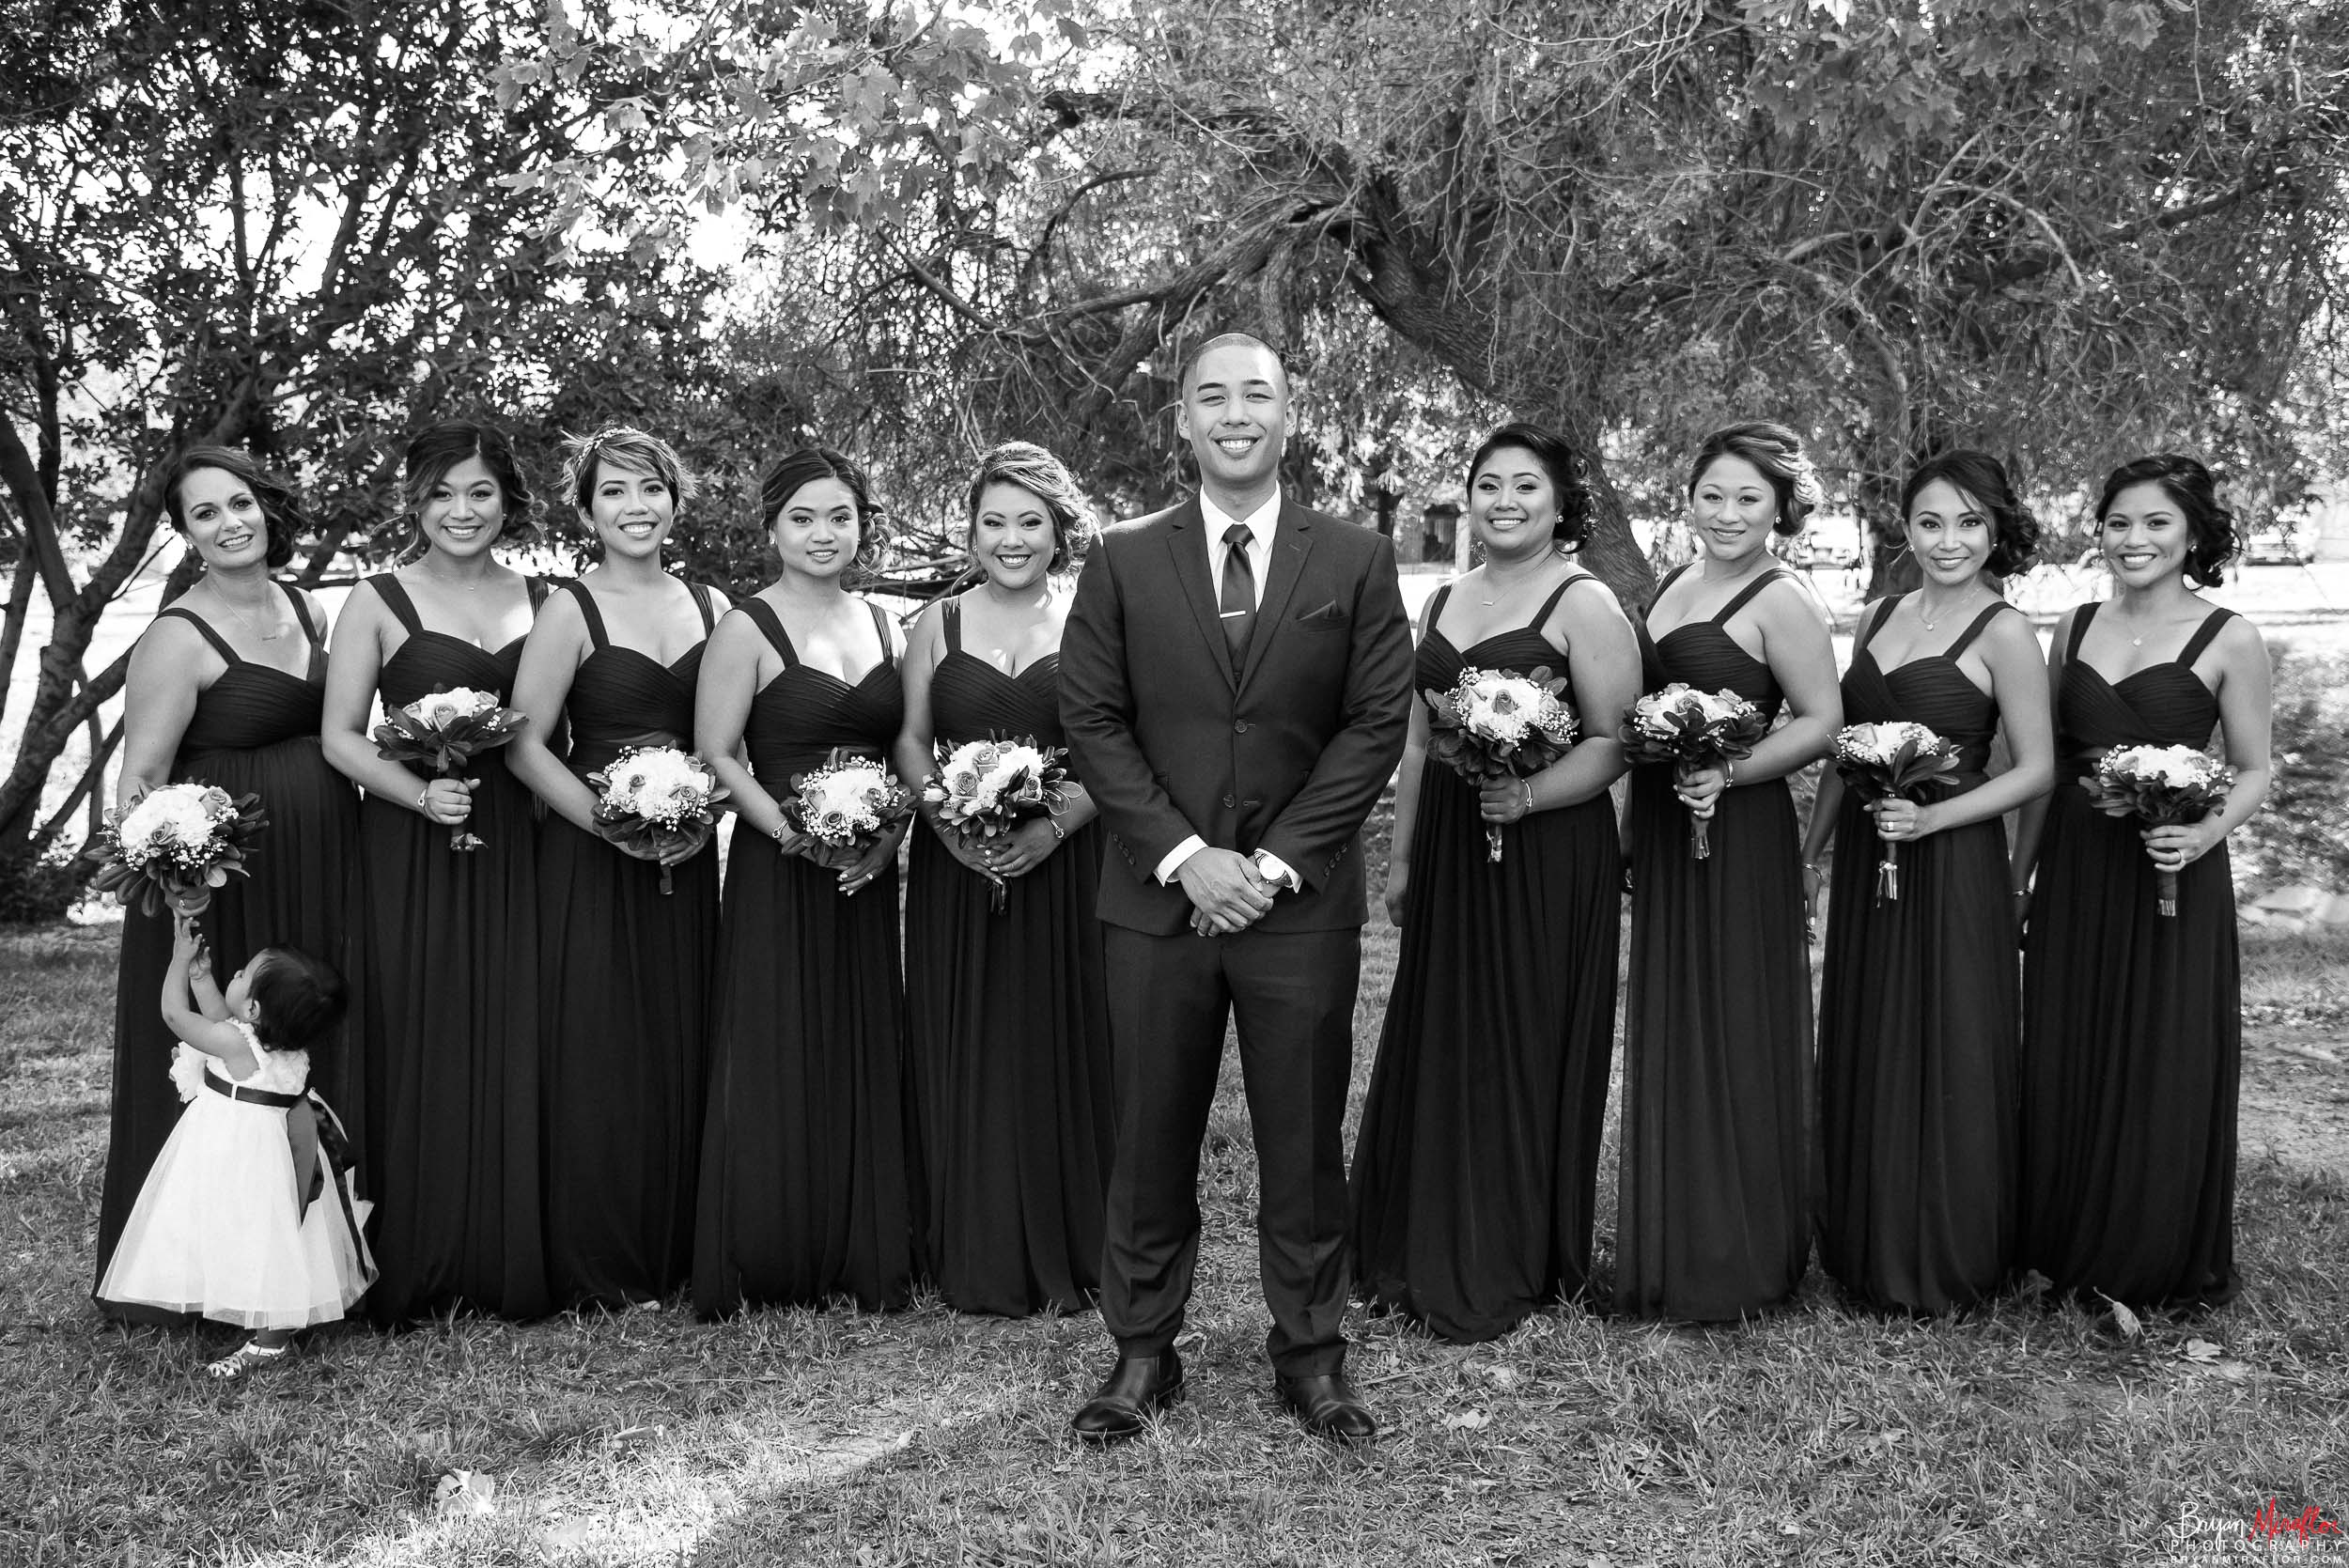 Bryan-Miraflor-Photography-Trisha-Dexter-Married-20170923-035.jpg